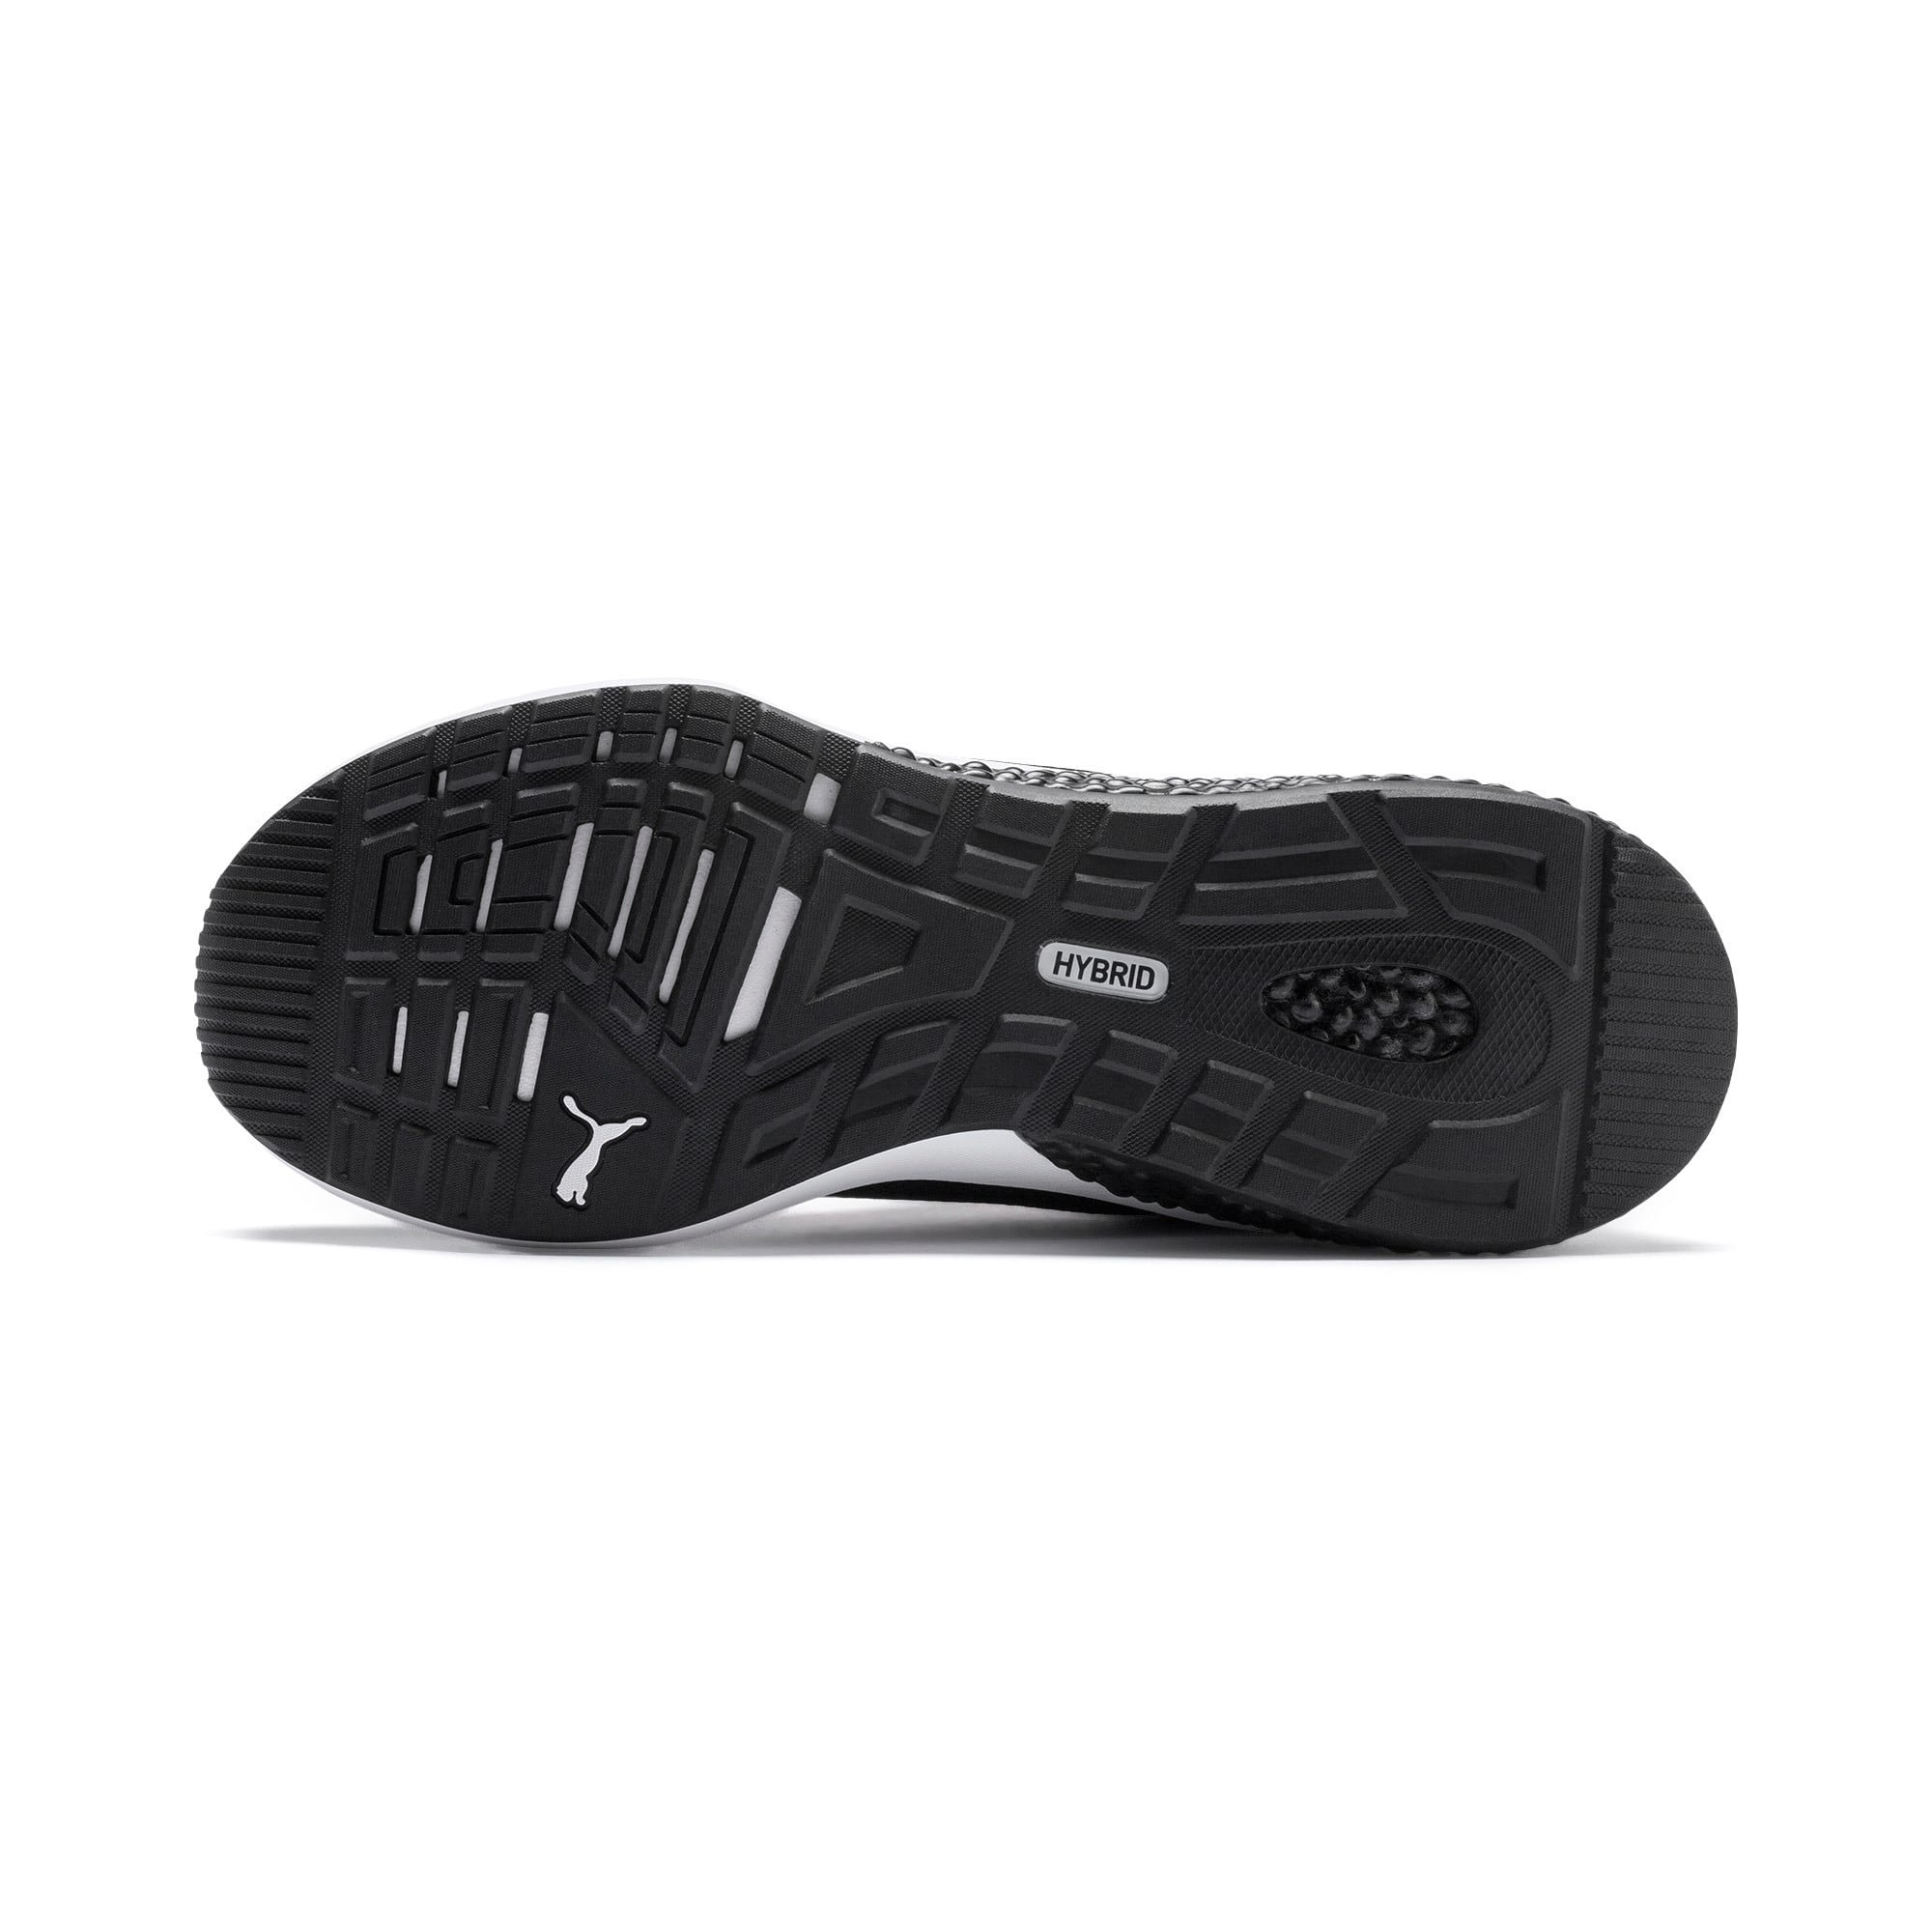 Thumbnail 5 of HYBRID NX Men's Running Shoes, Black-Nrgy Red-Yellow Alert, medium